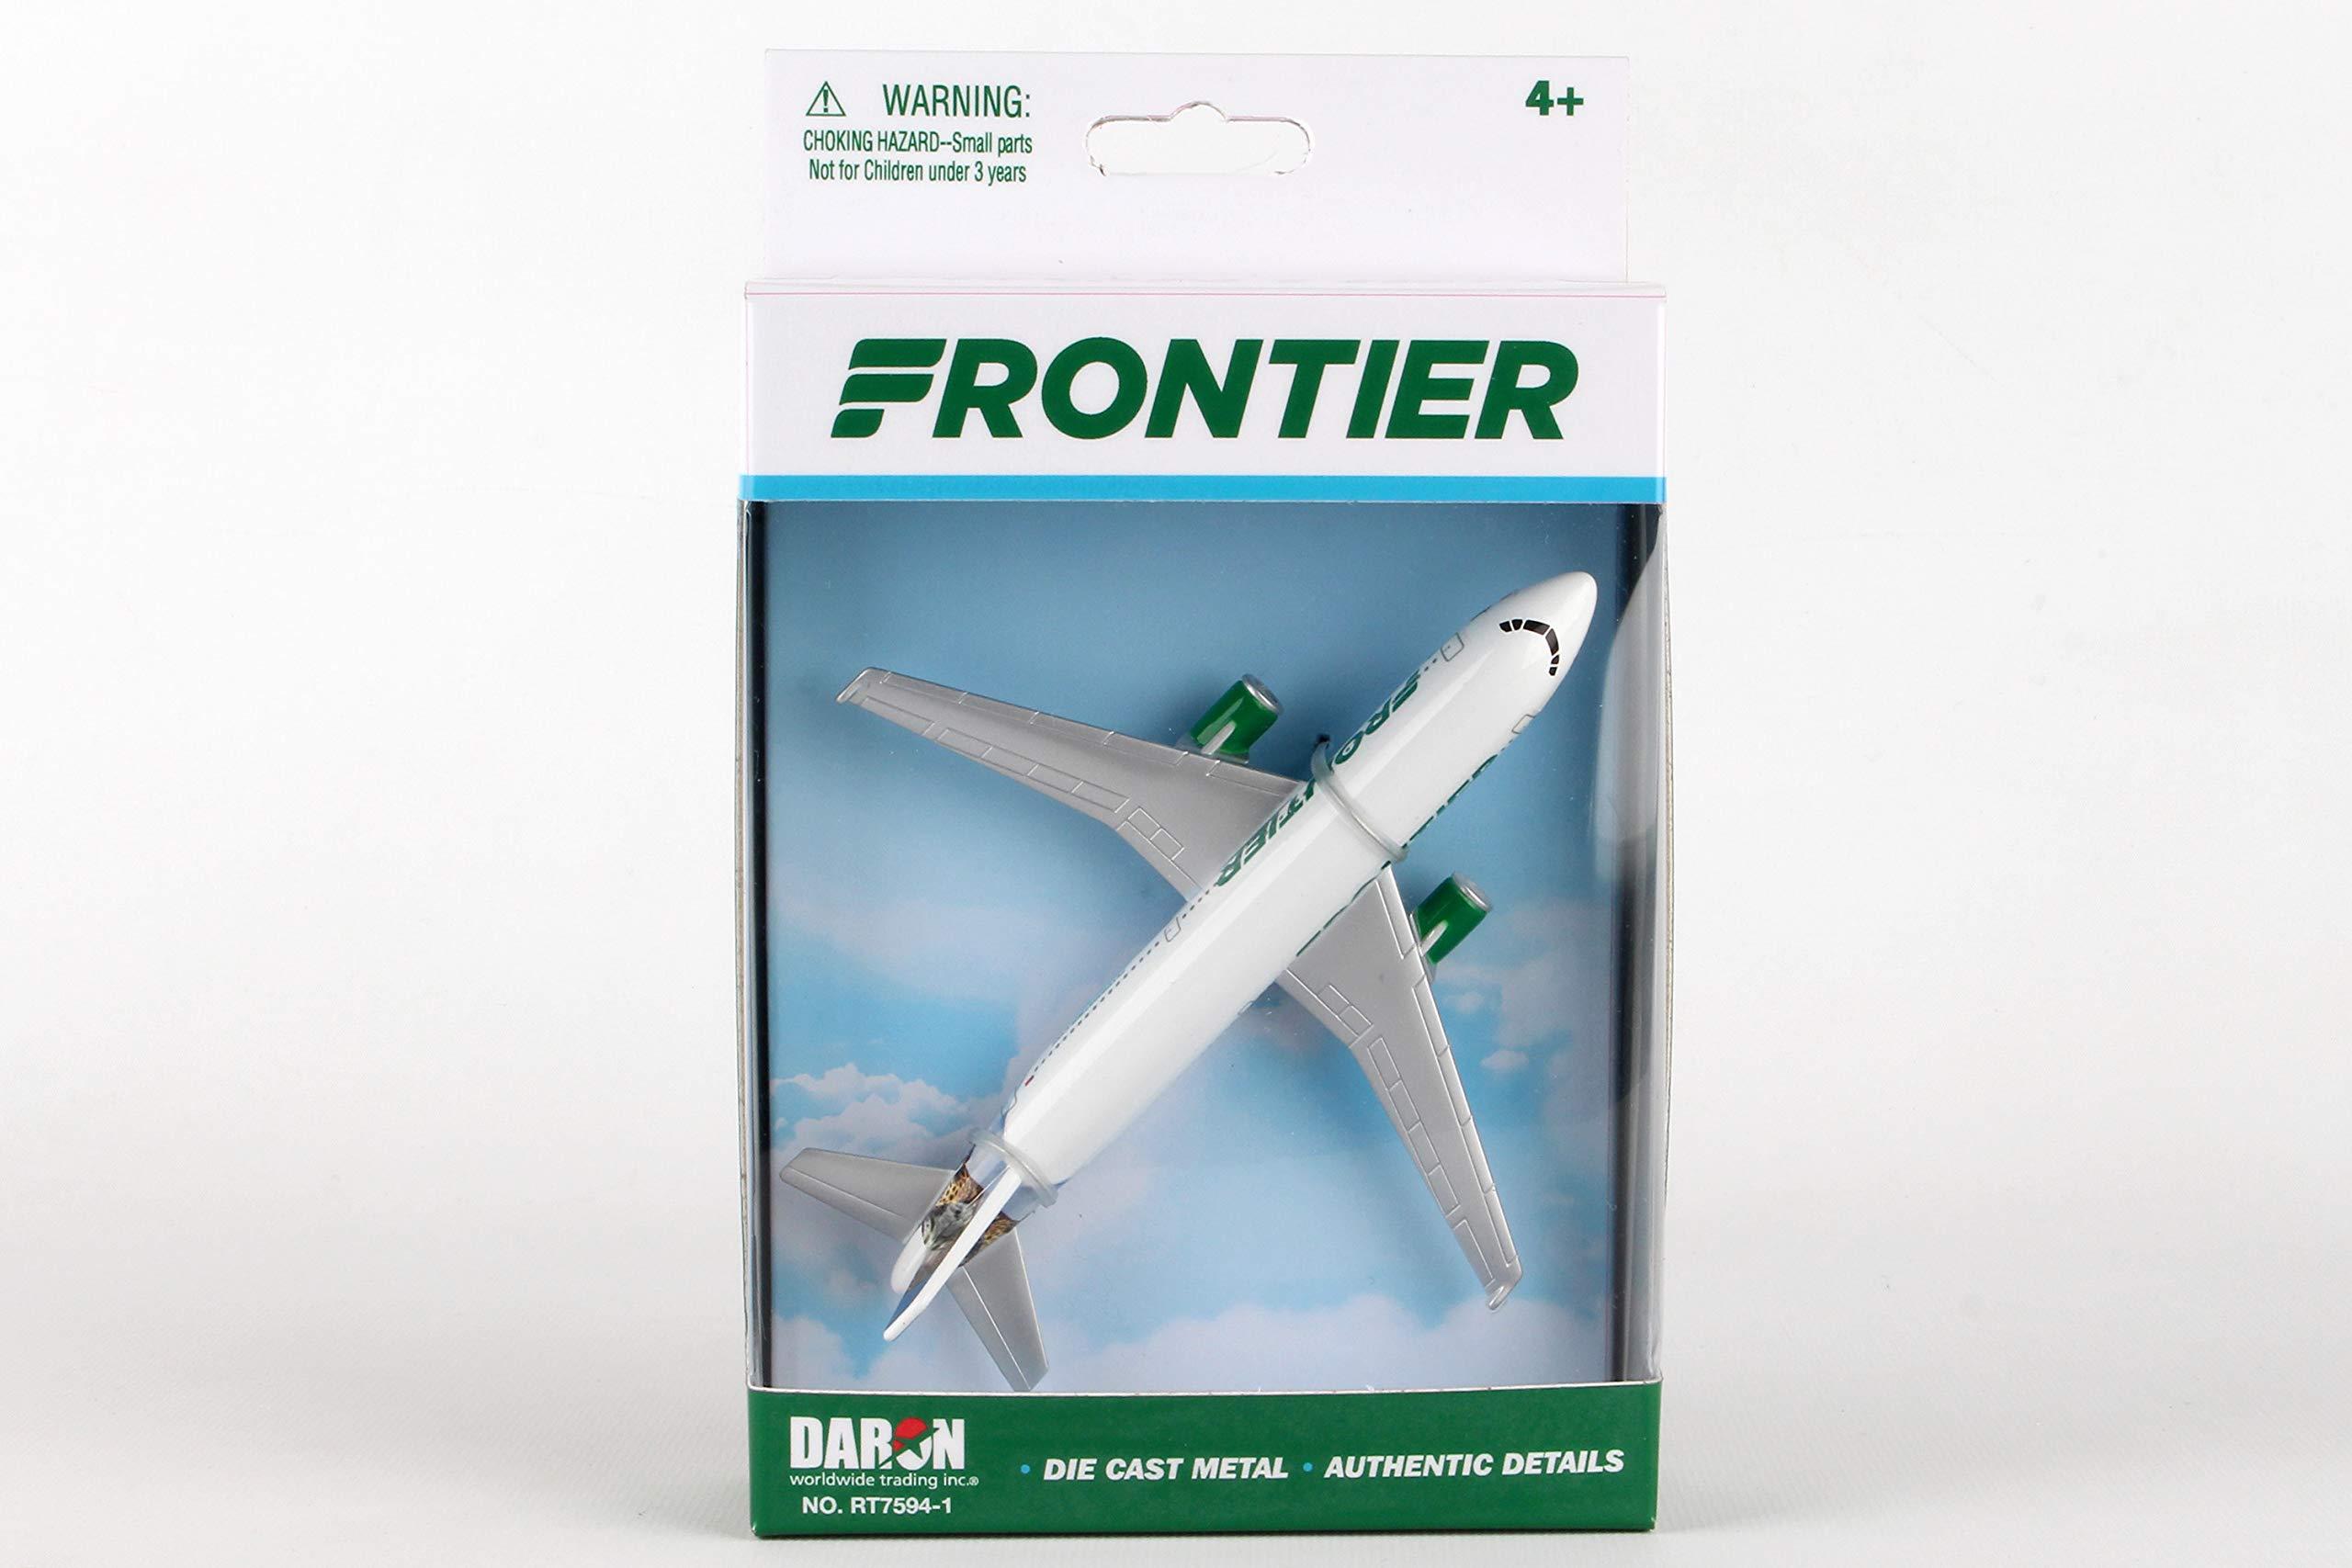 Daron Frontier Single Plane